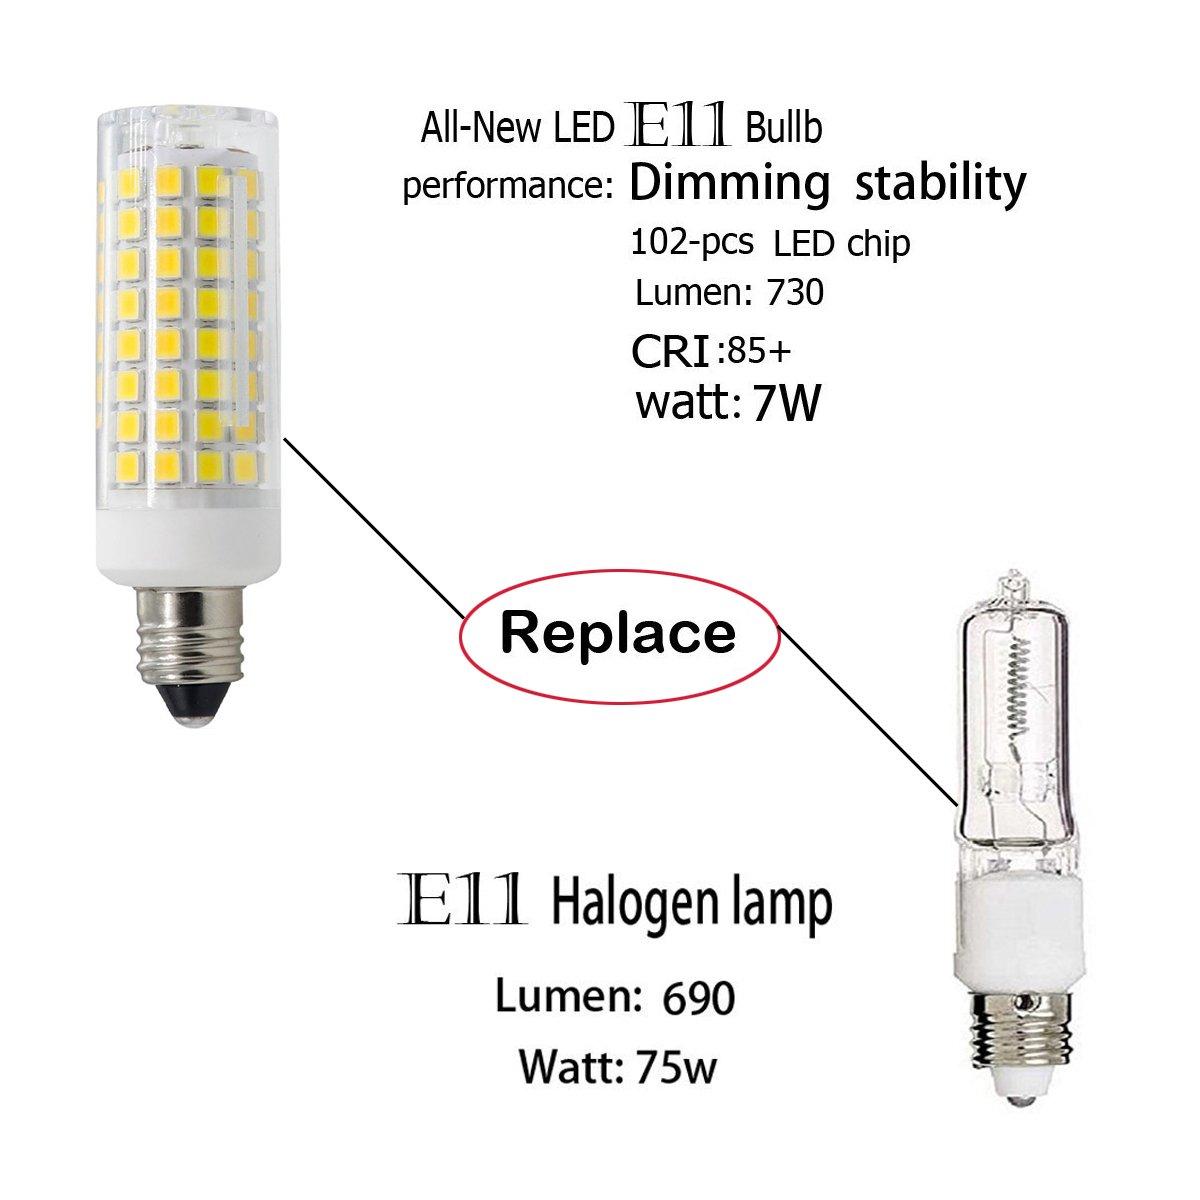 led e11 light bulb all new 102leds e11 led bulbs 7w 75w rh amazon com